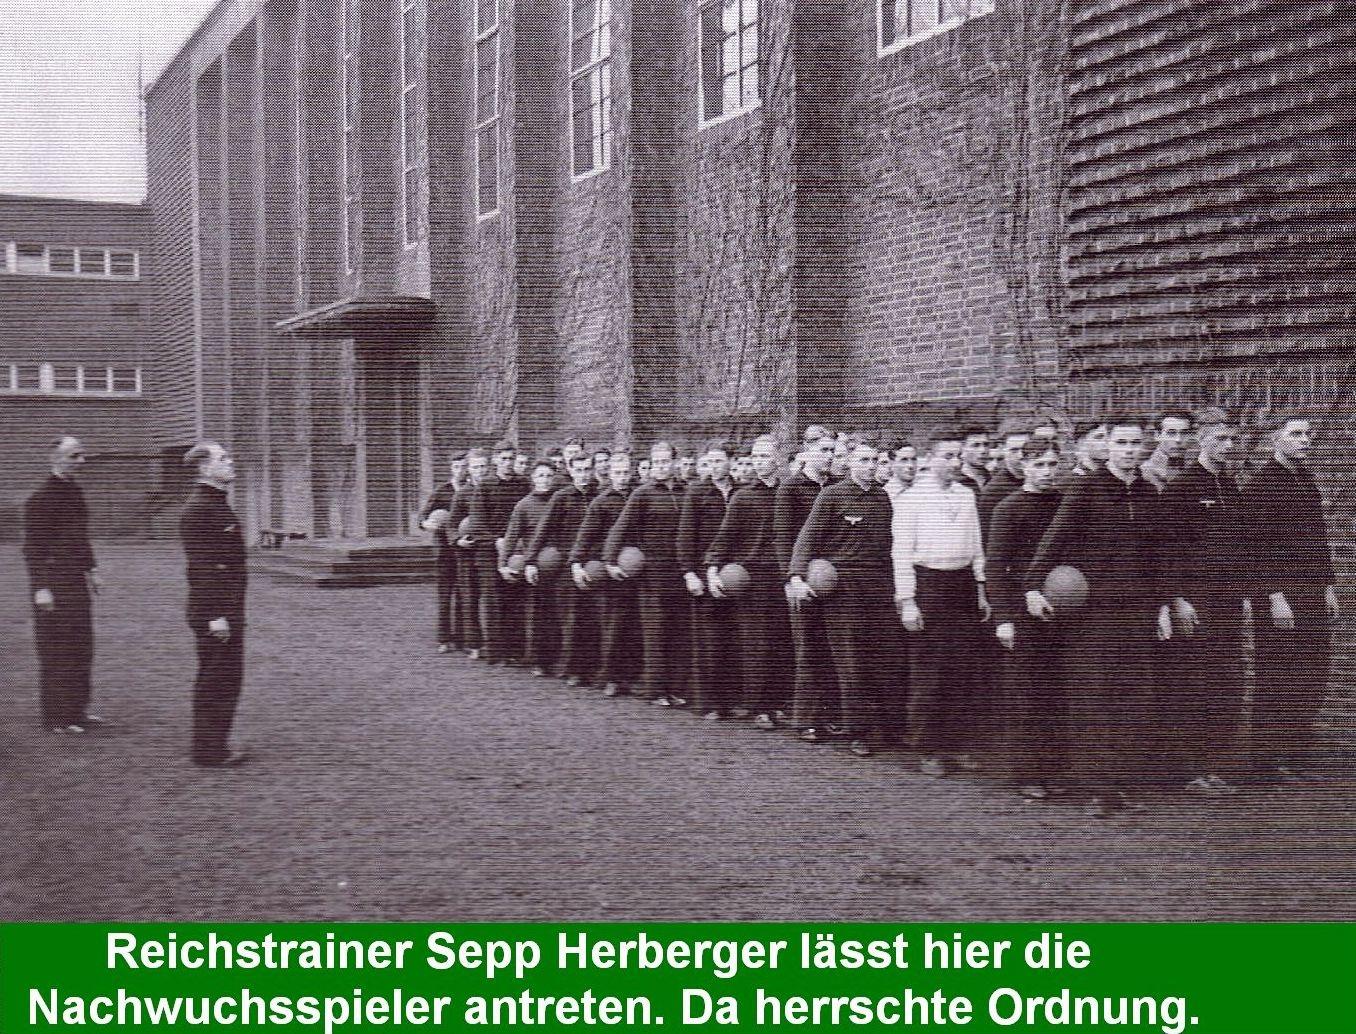 Reichstrainer Sepp Herberger